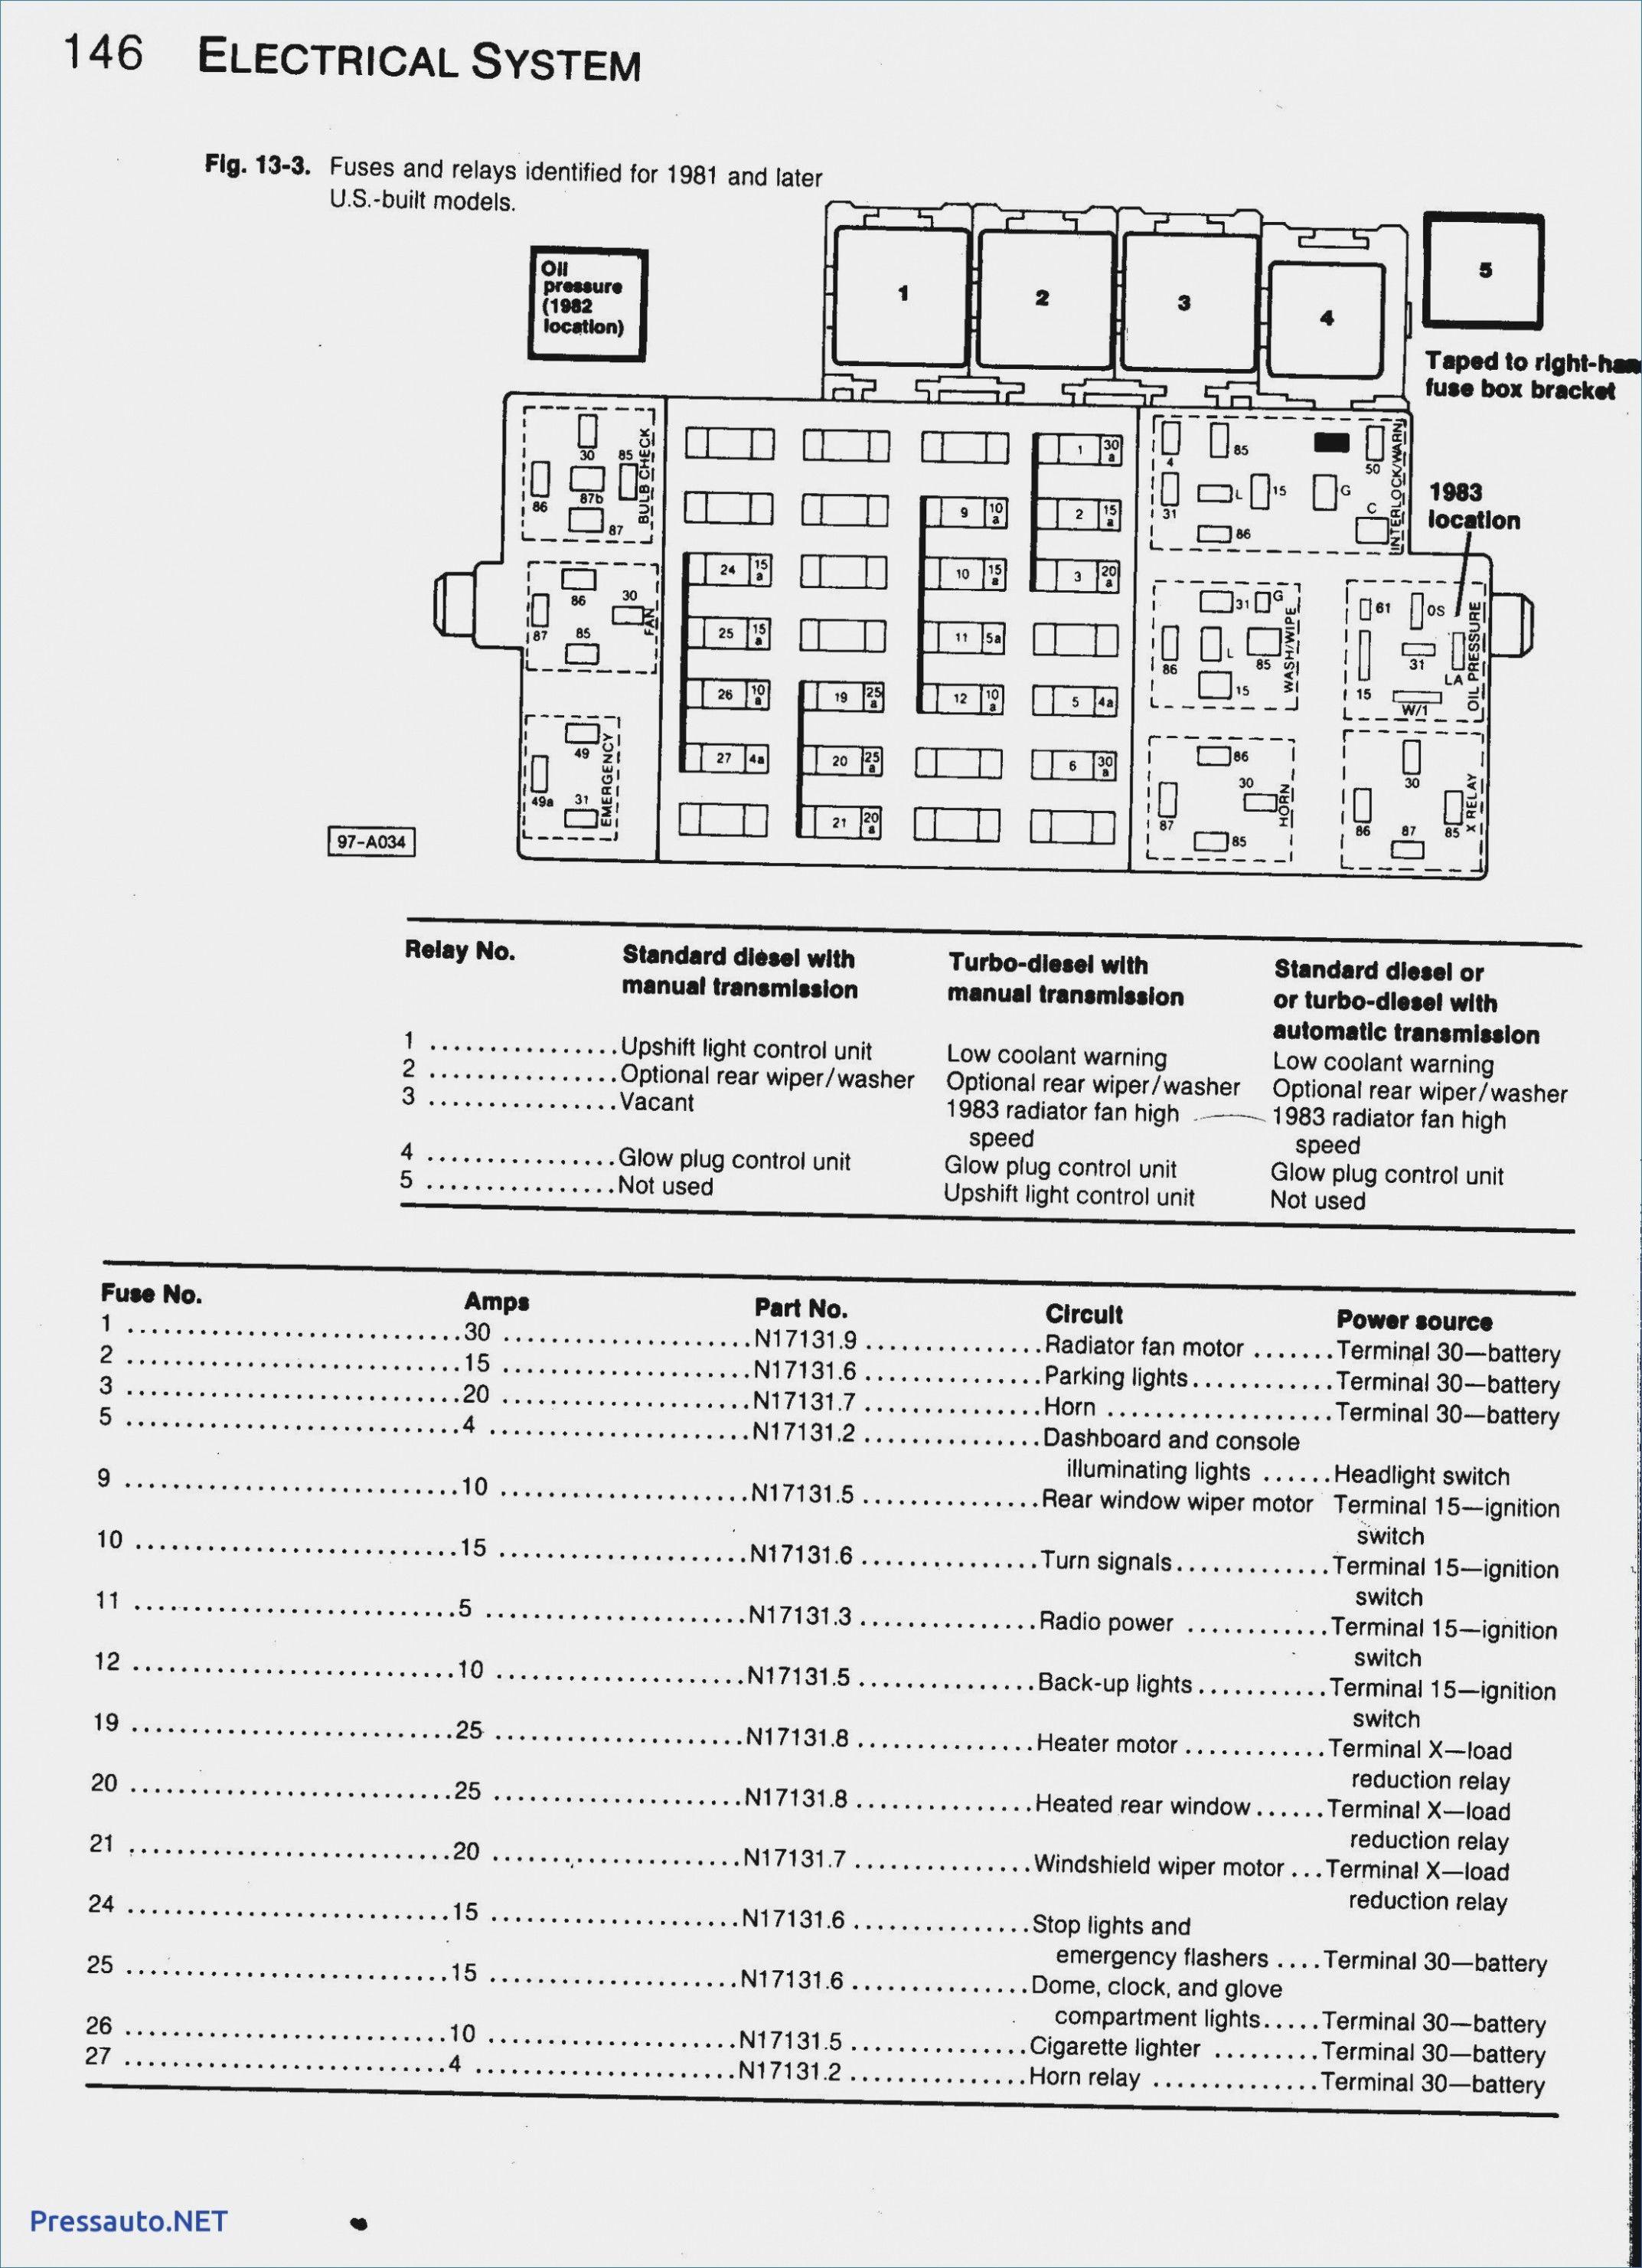 2003 Trailblazer Power Lock Wiring Fuse Box Vw Jetta Diagram